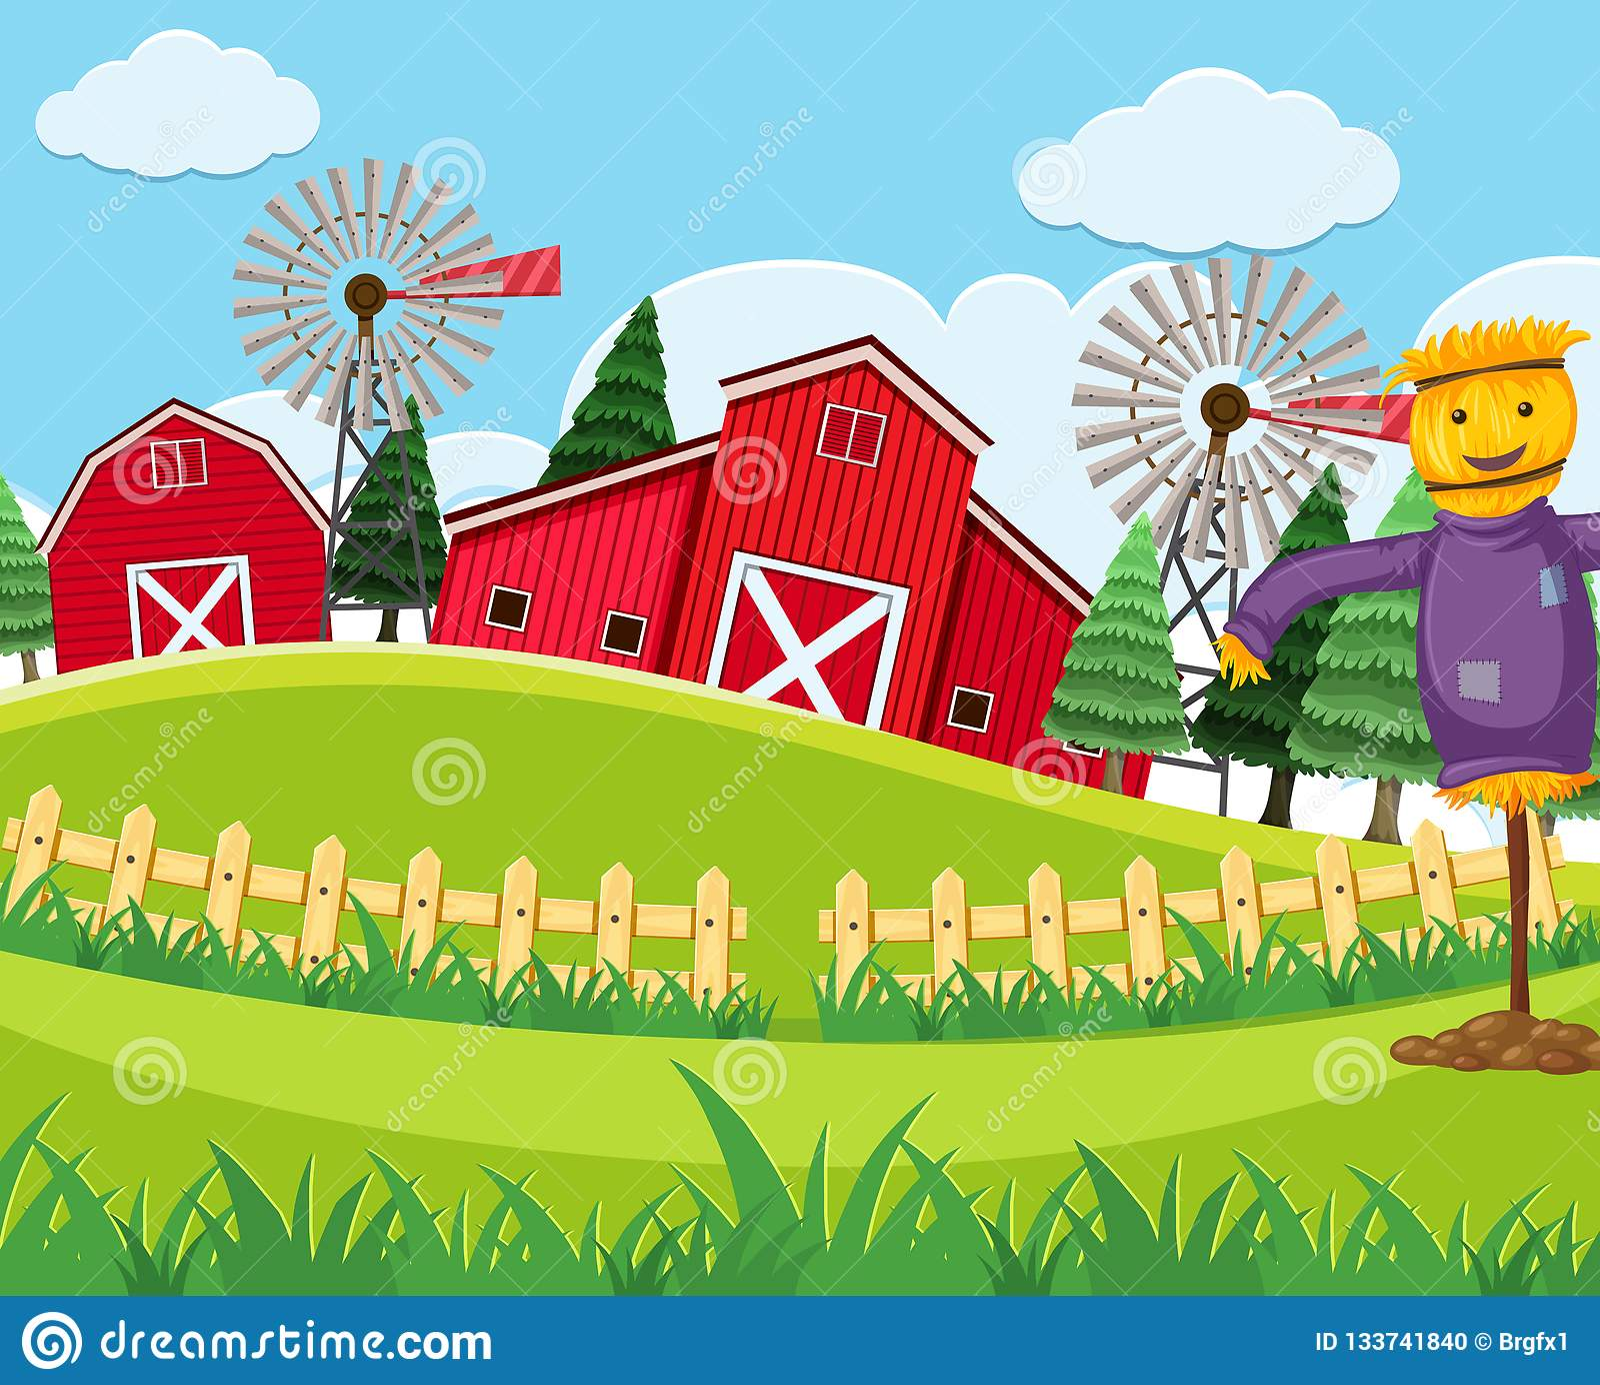 Red barn farm scene stock illustration. Illustration of ...